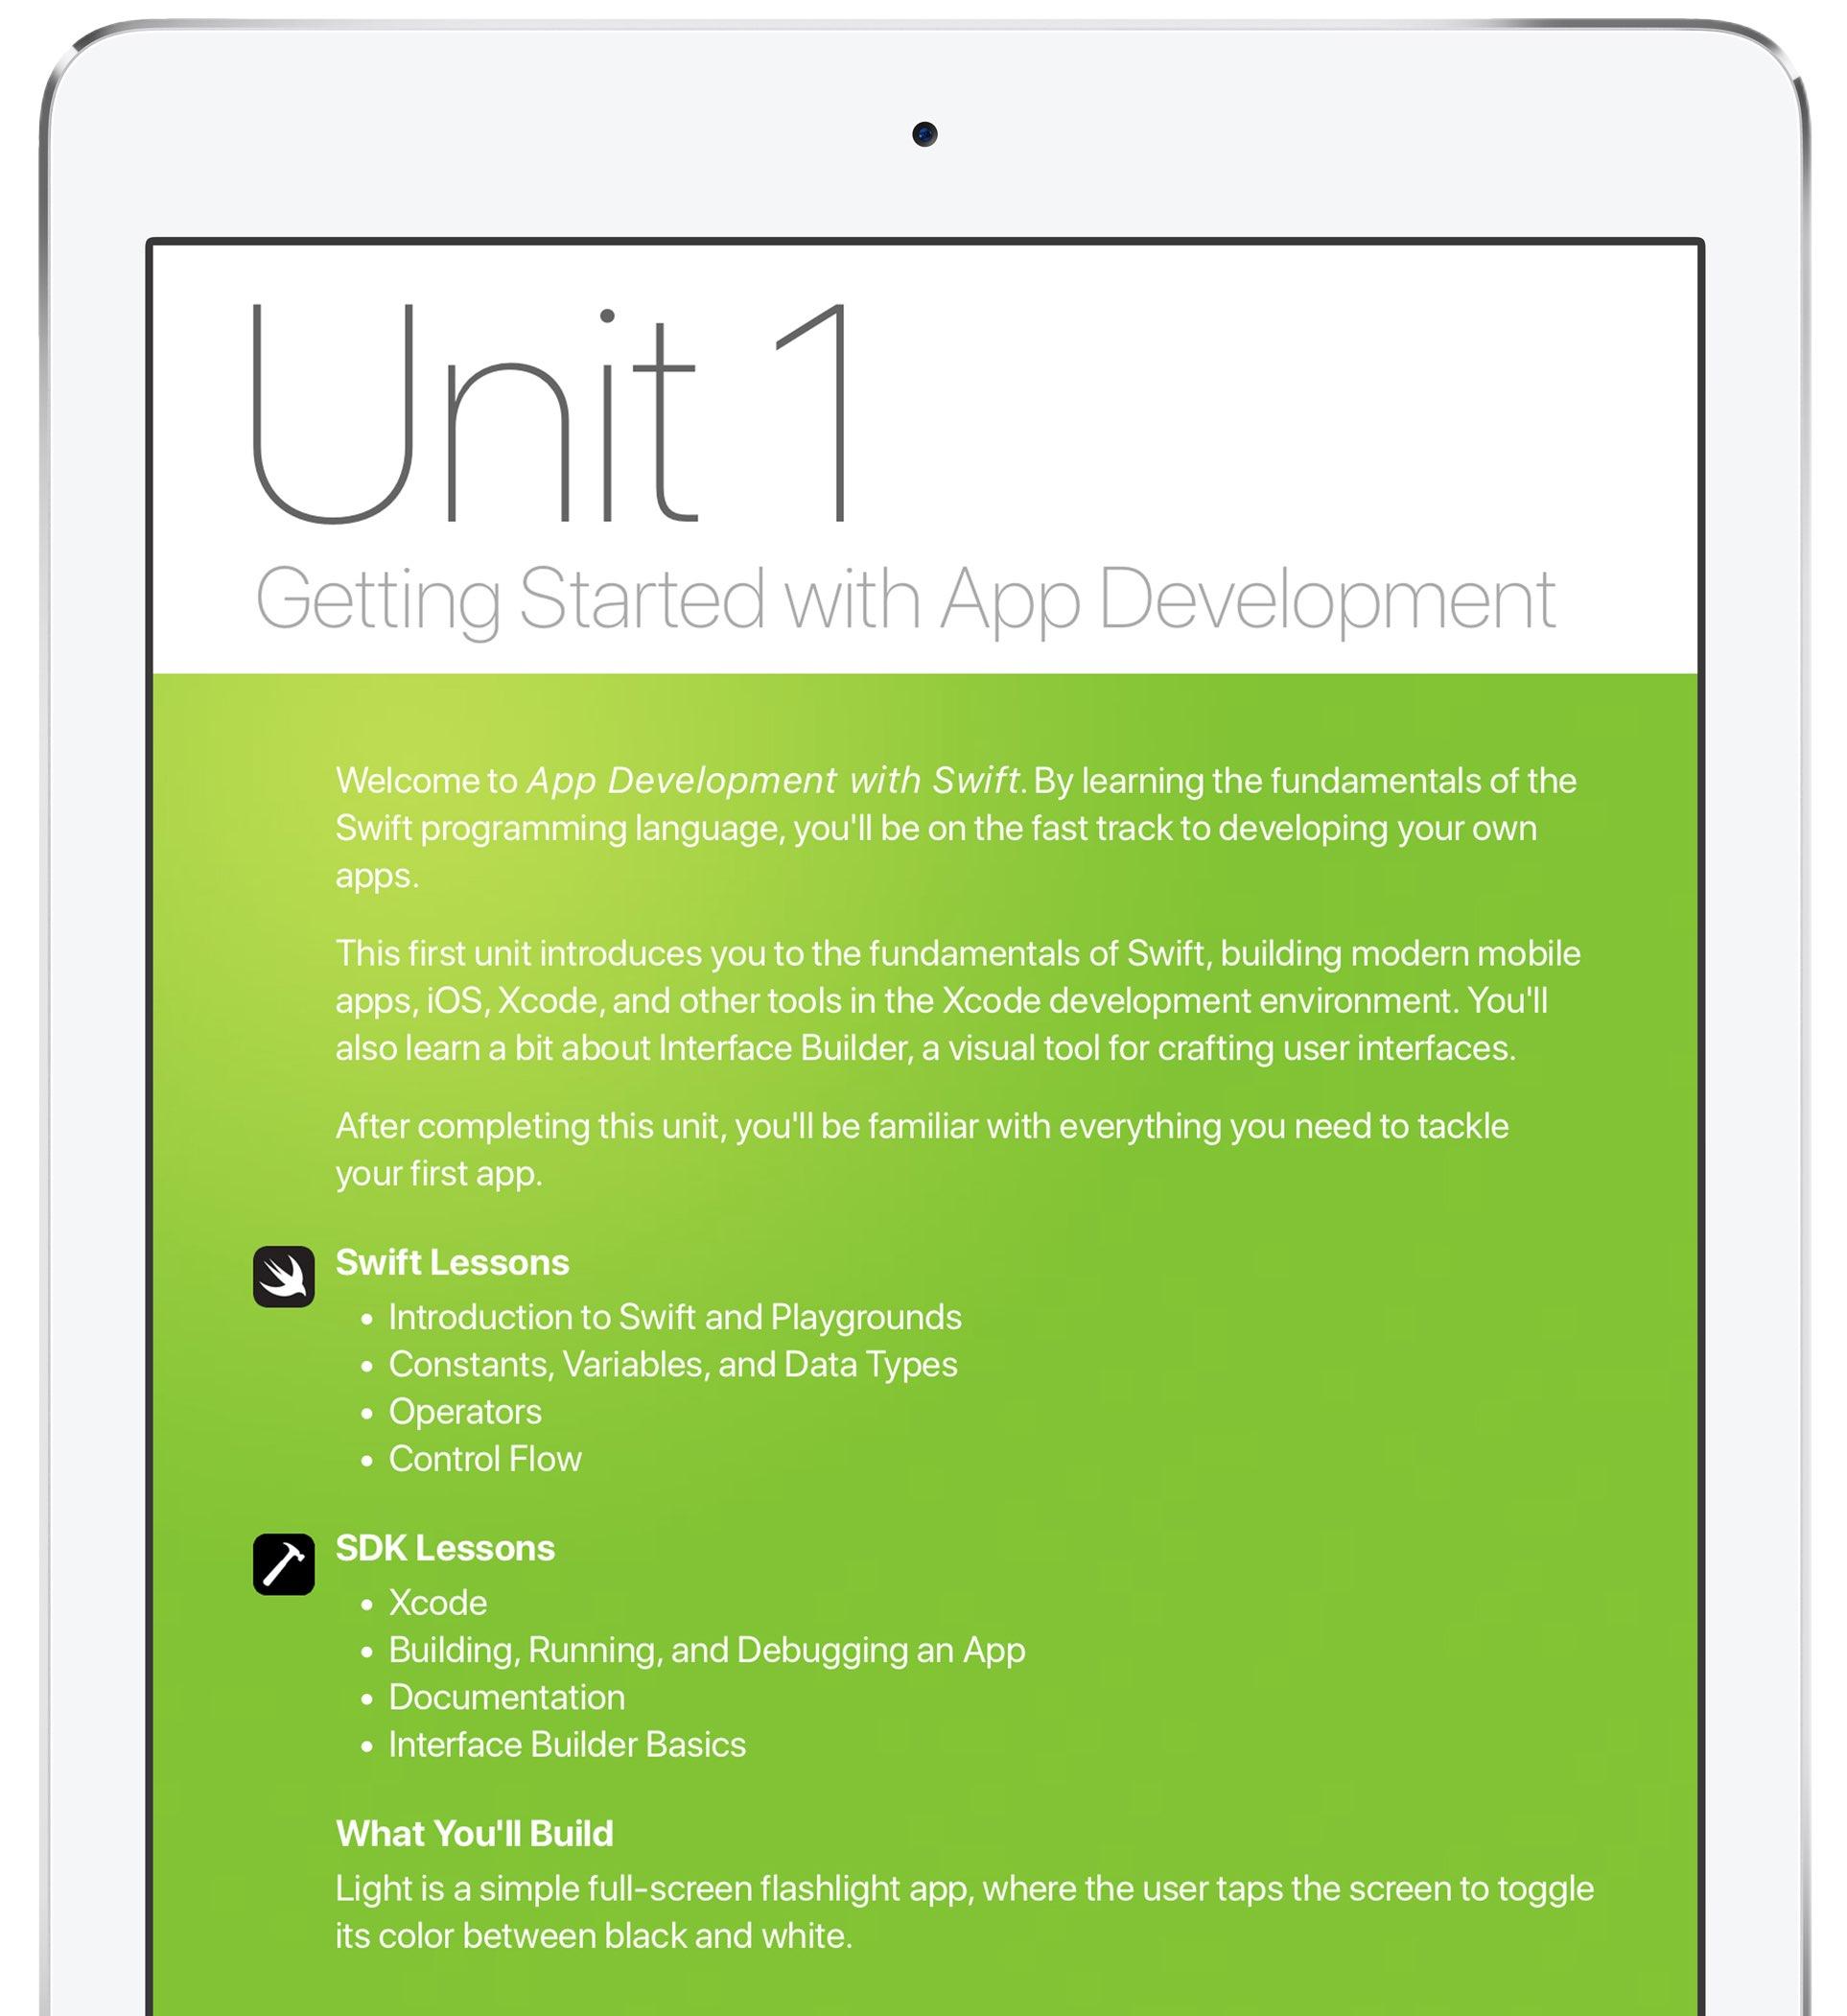 Download Apple's new Swift app development curriculum from